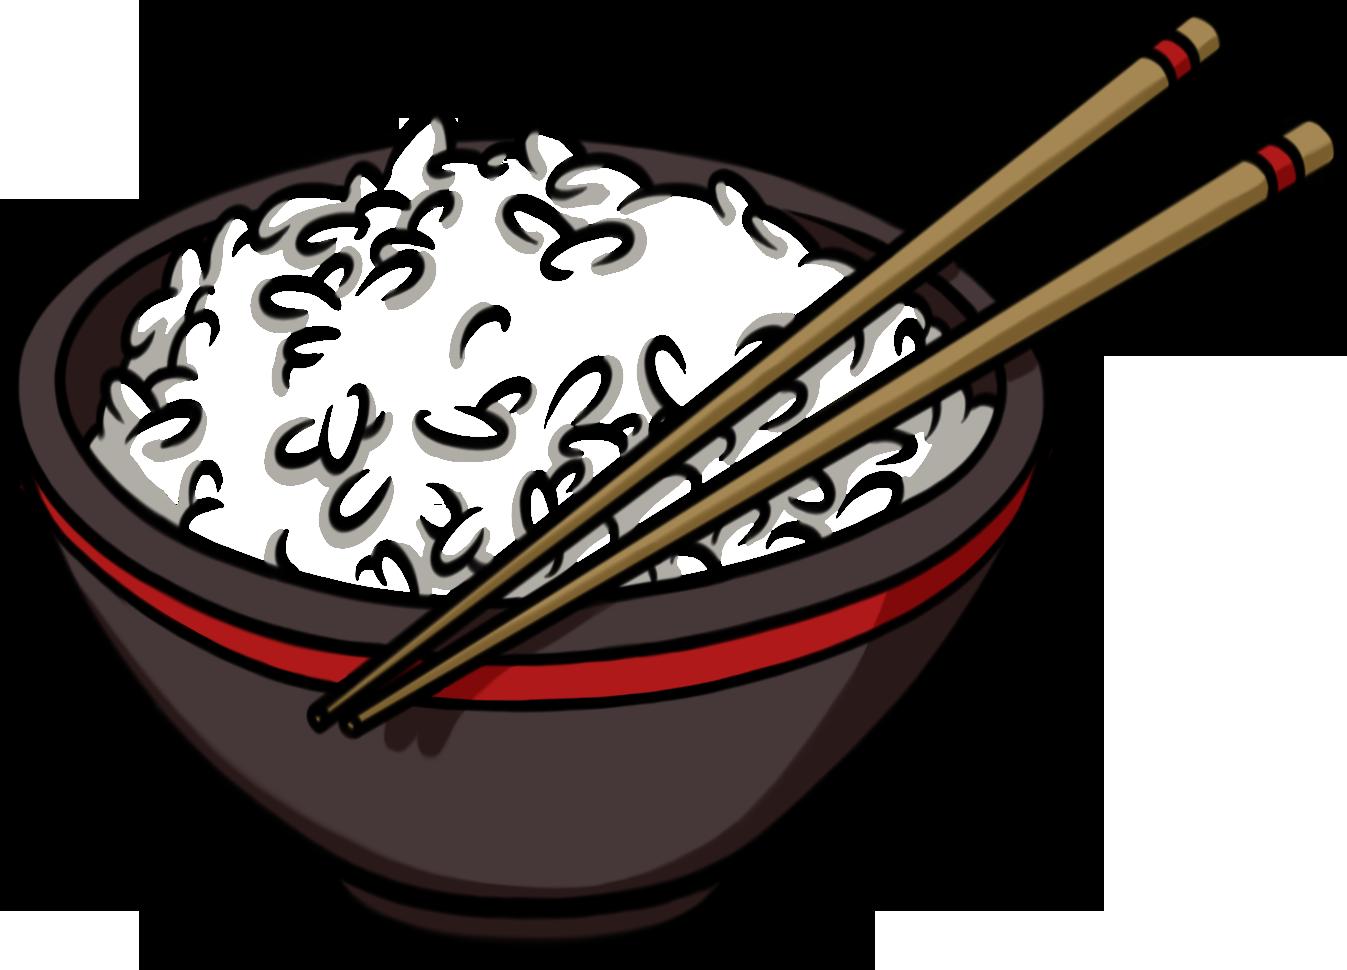 png free Rice at getdrawings com. Chopsticks clipart drawing.